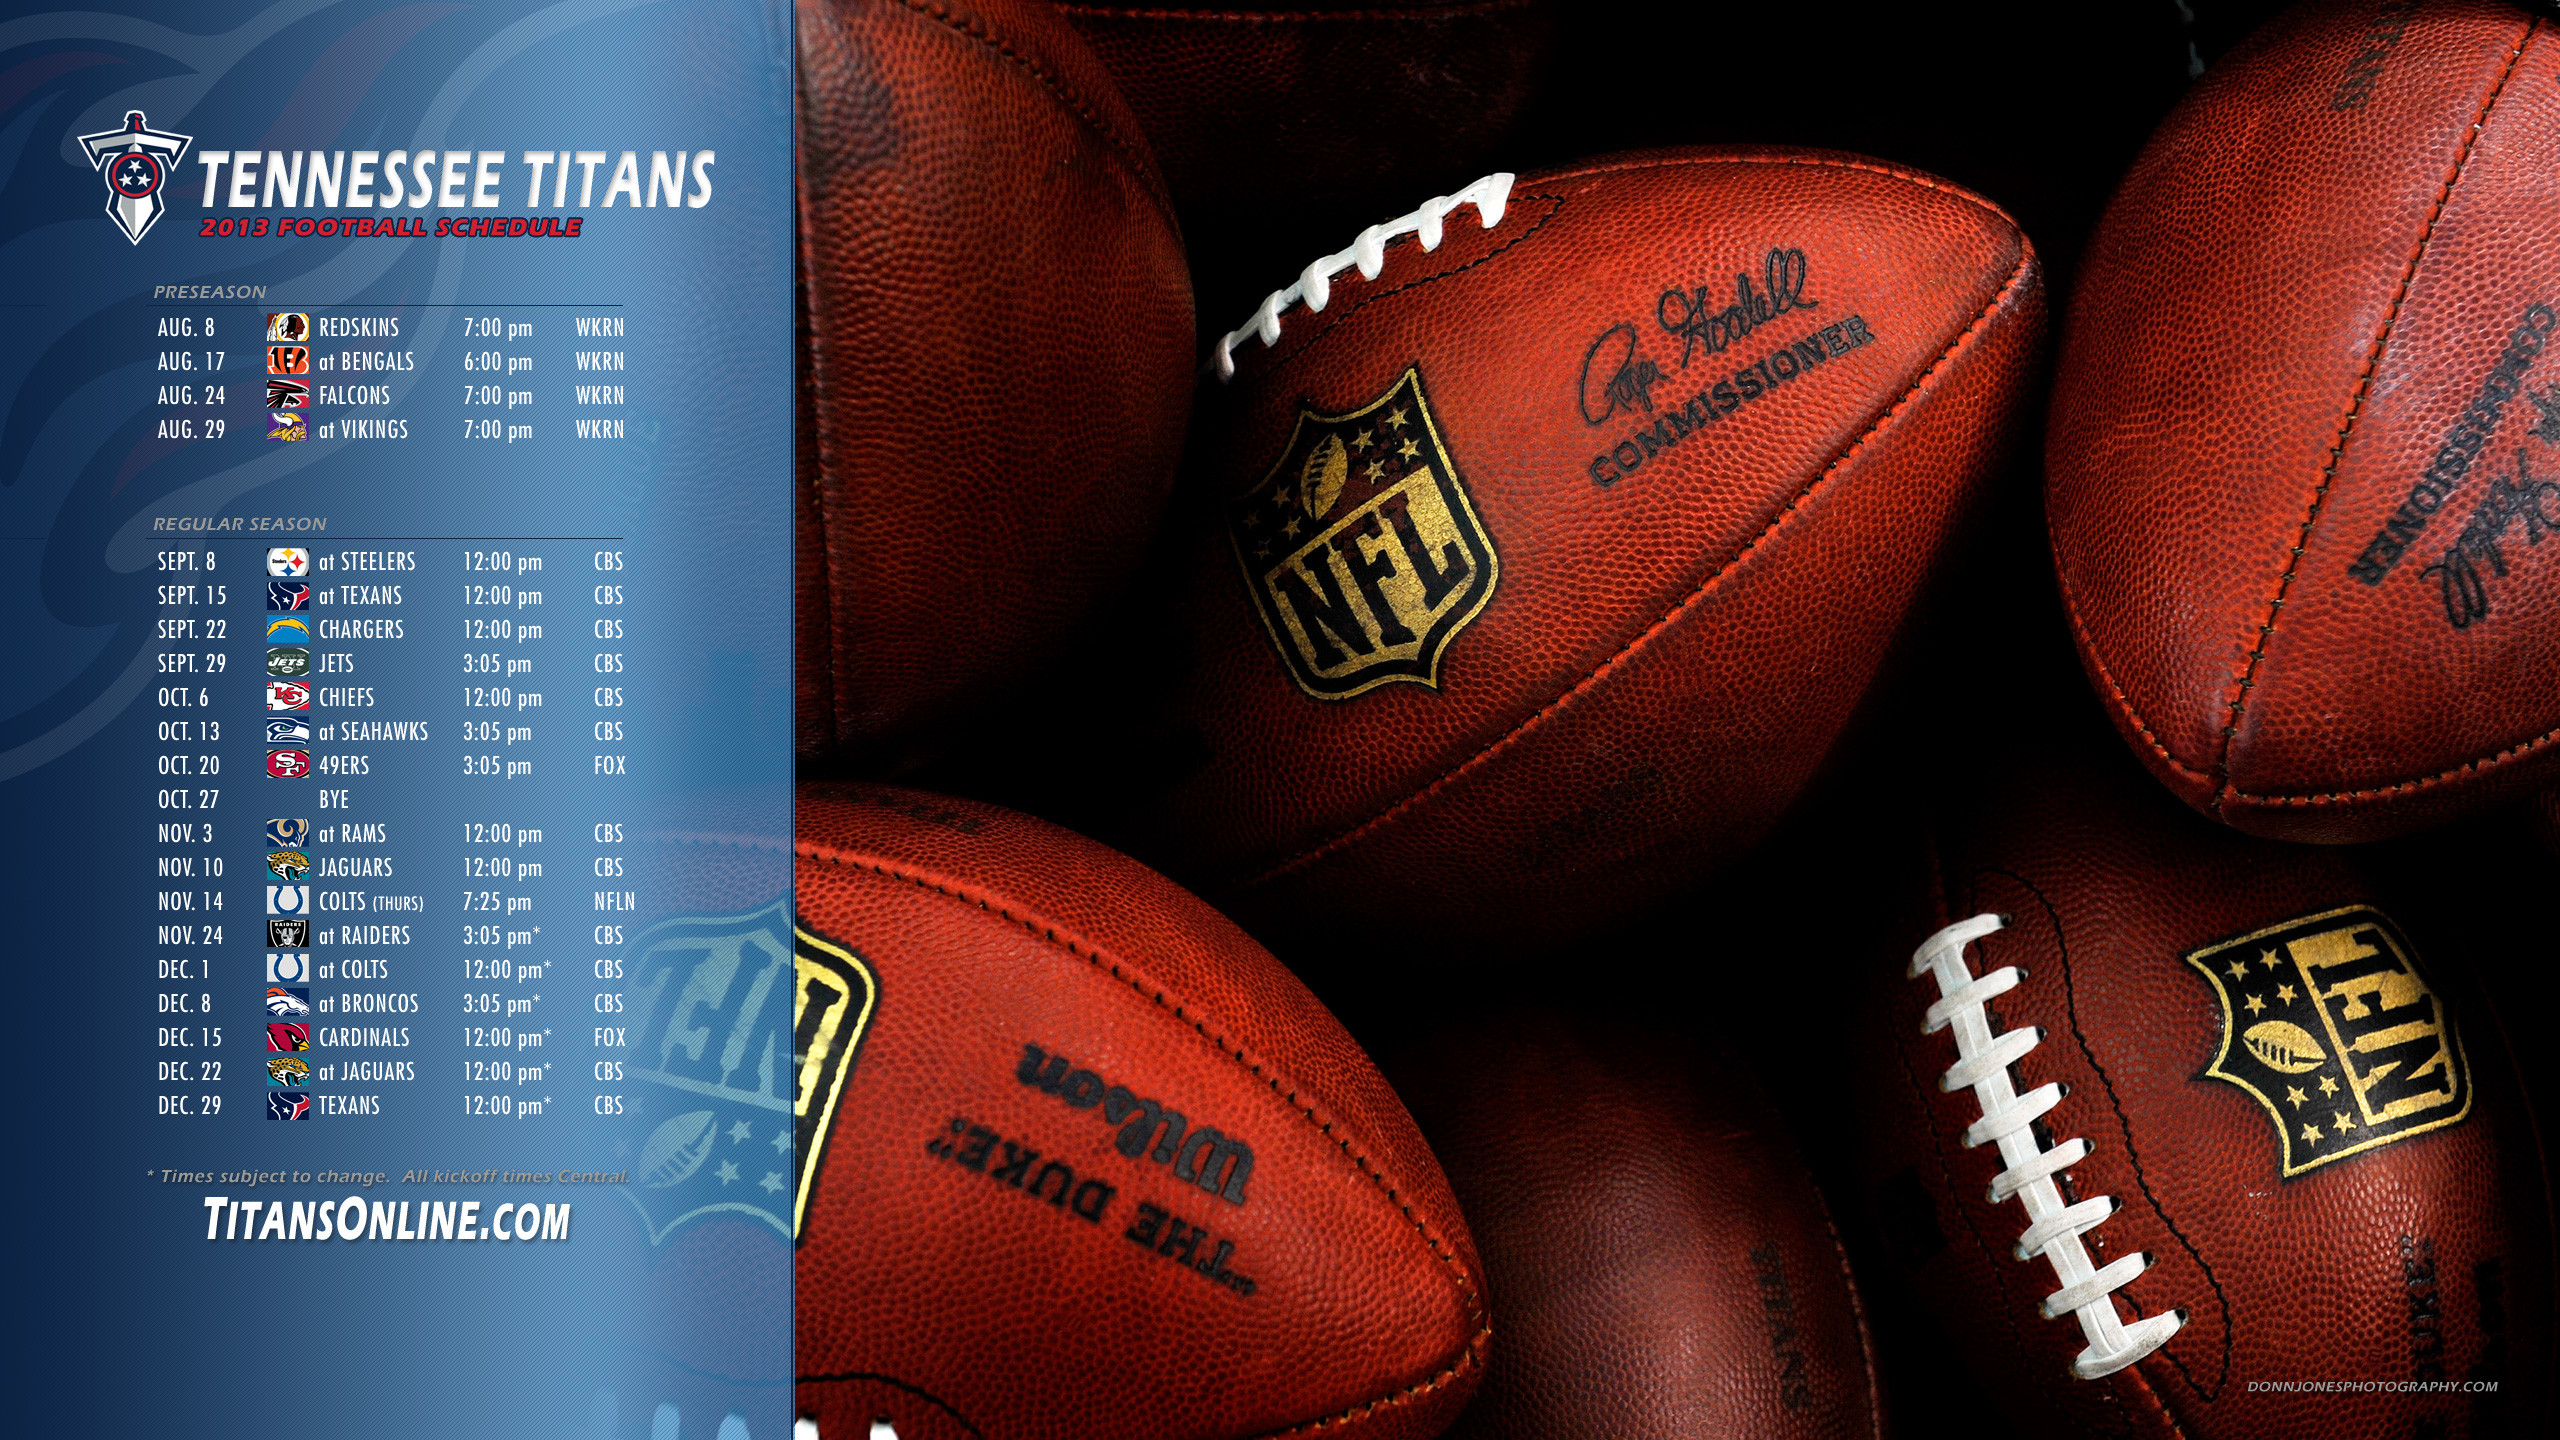 Tennessee Titans   Downloadable Desktop Wallpaper